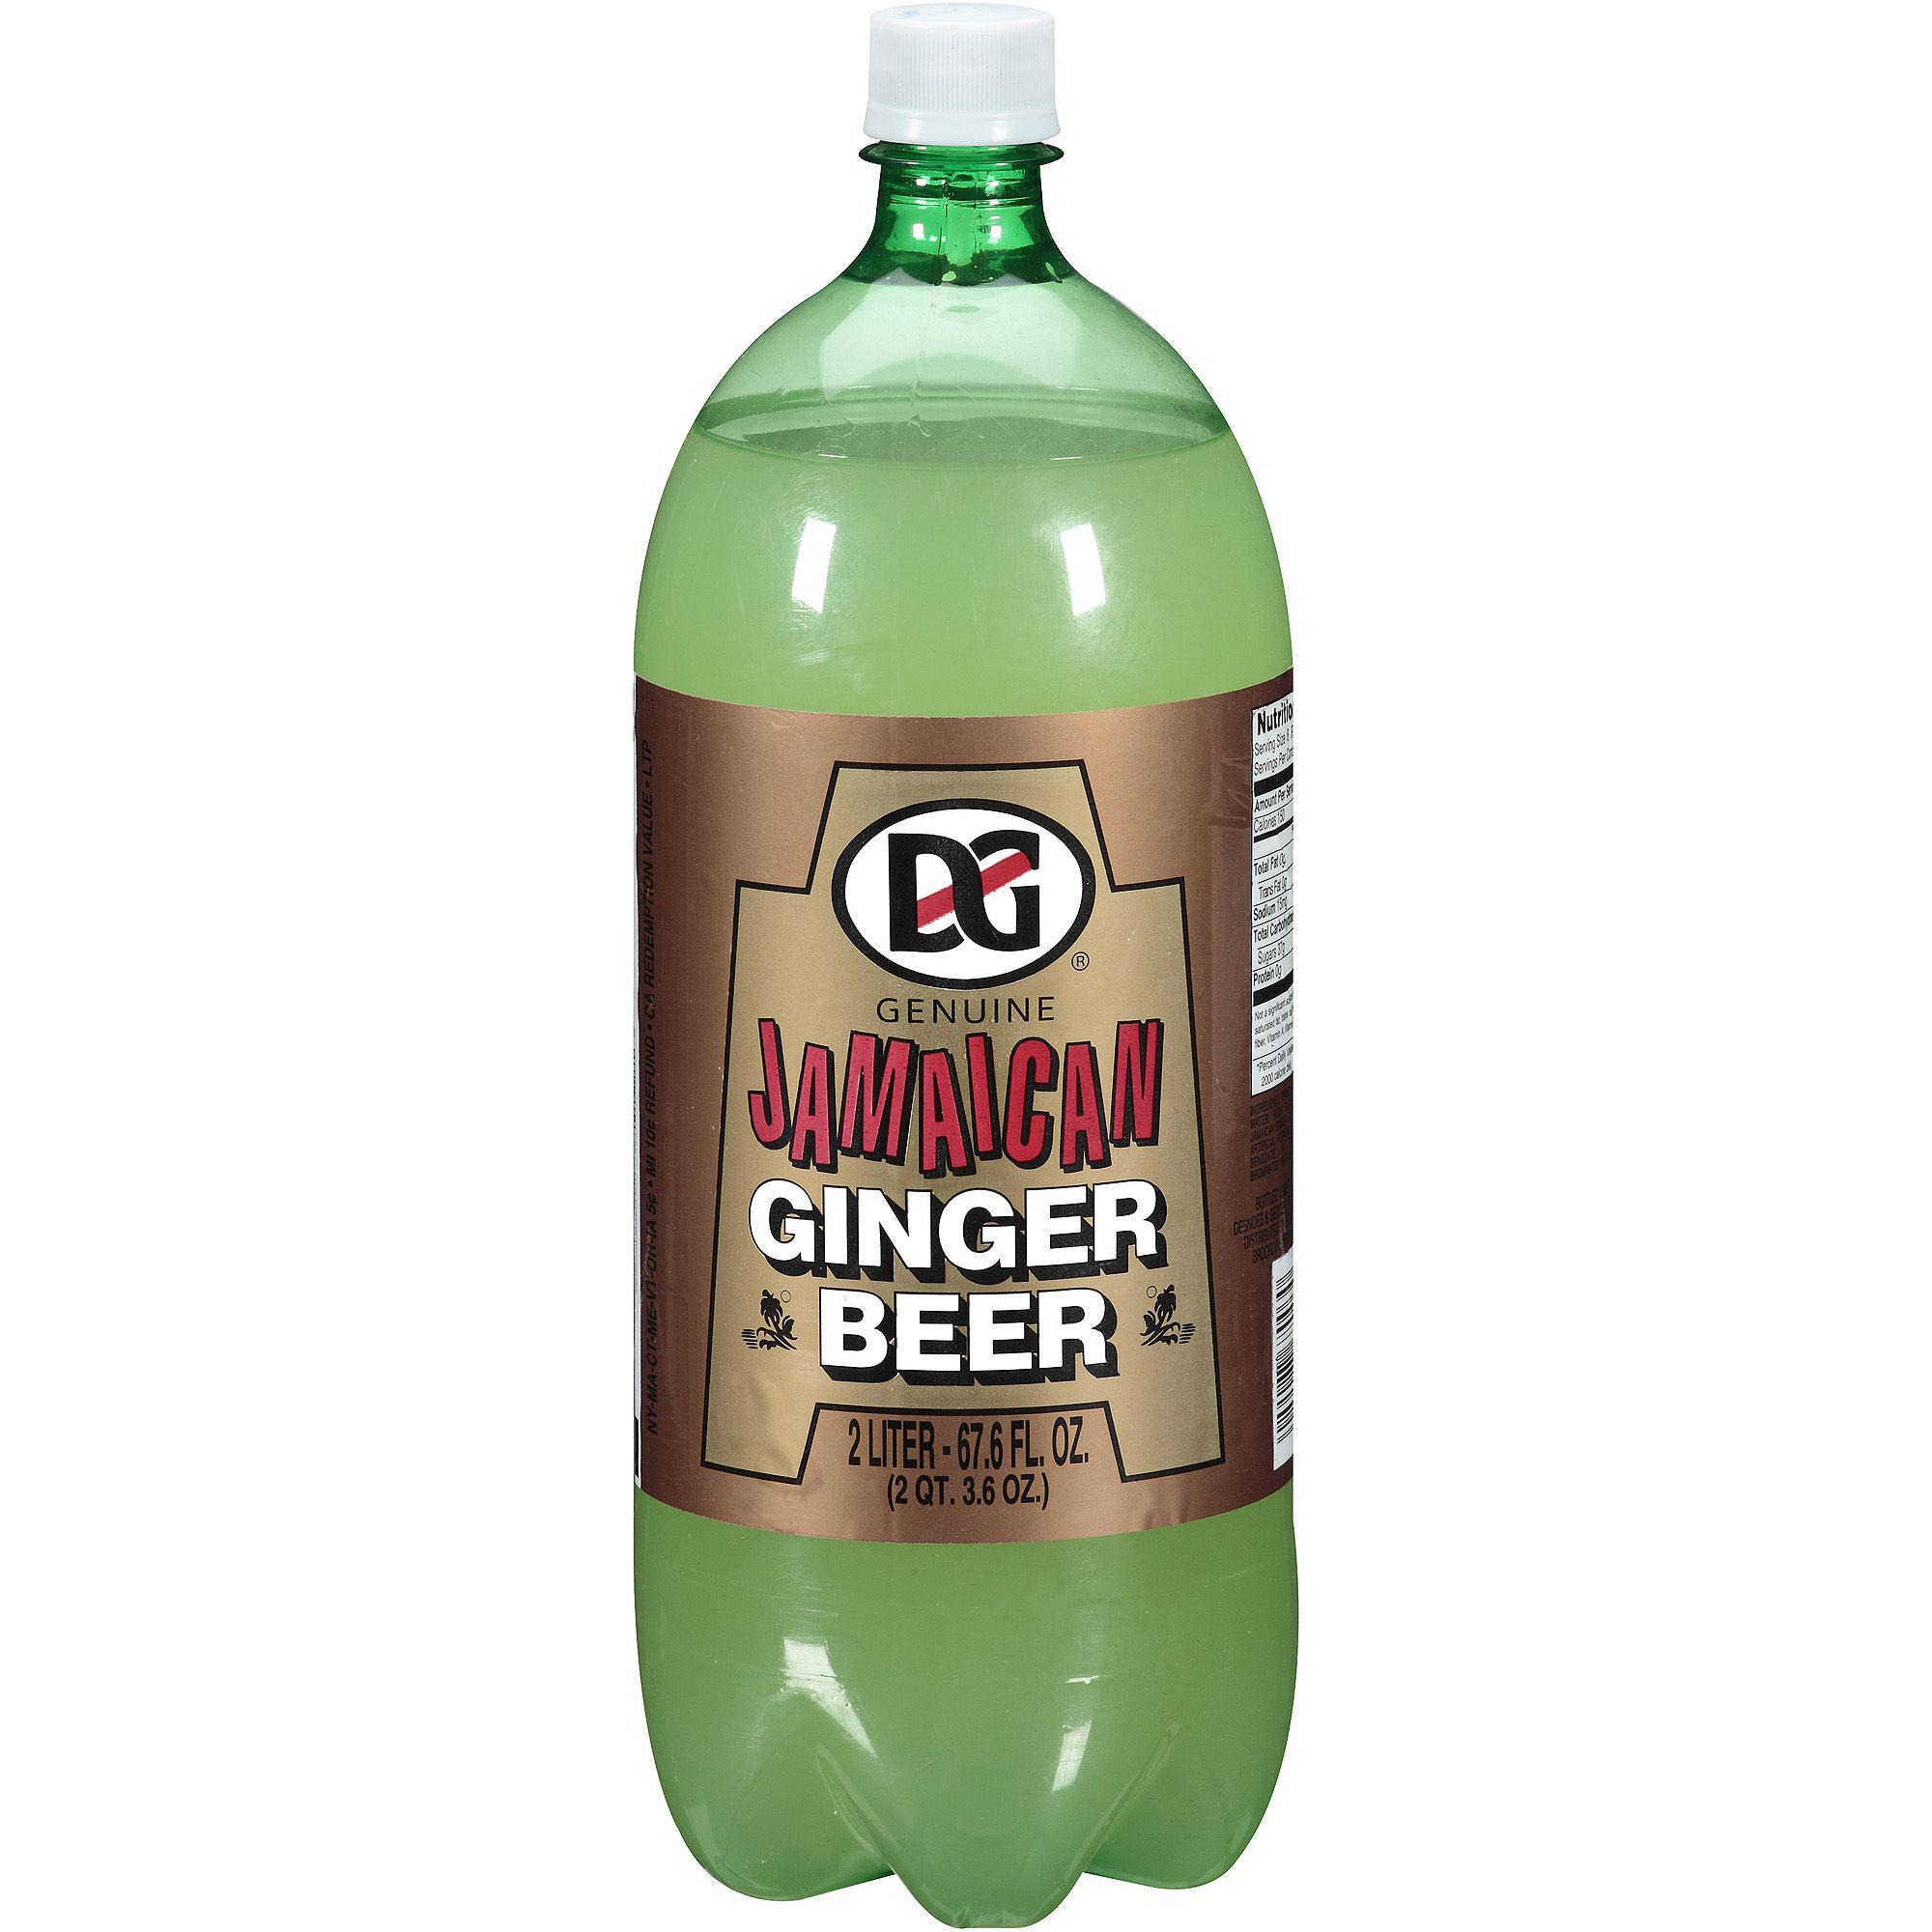 cold d&g sodas